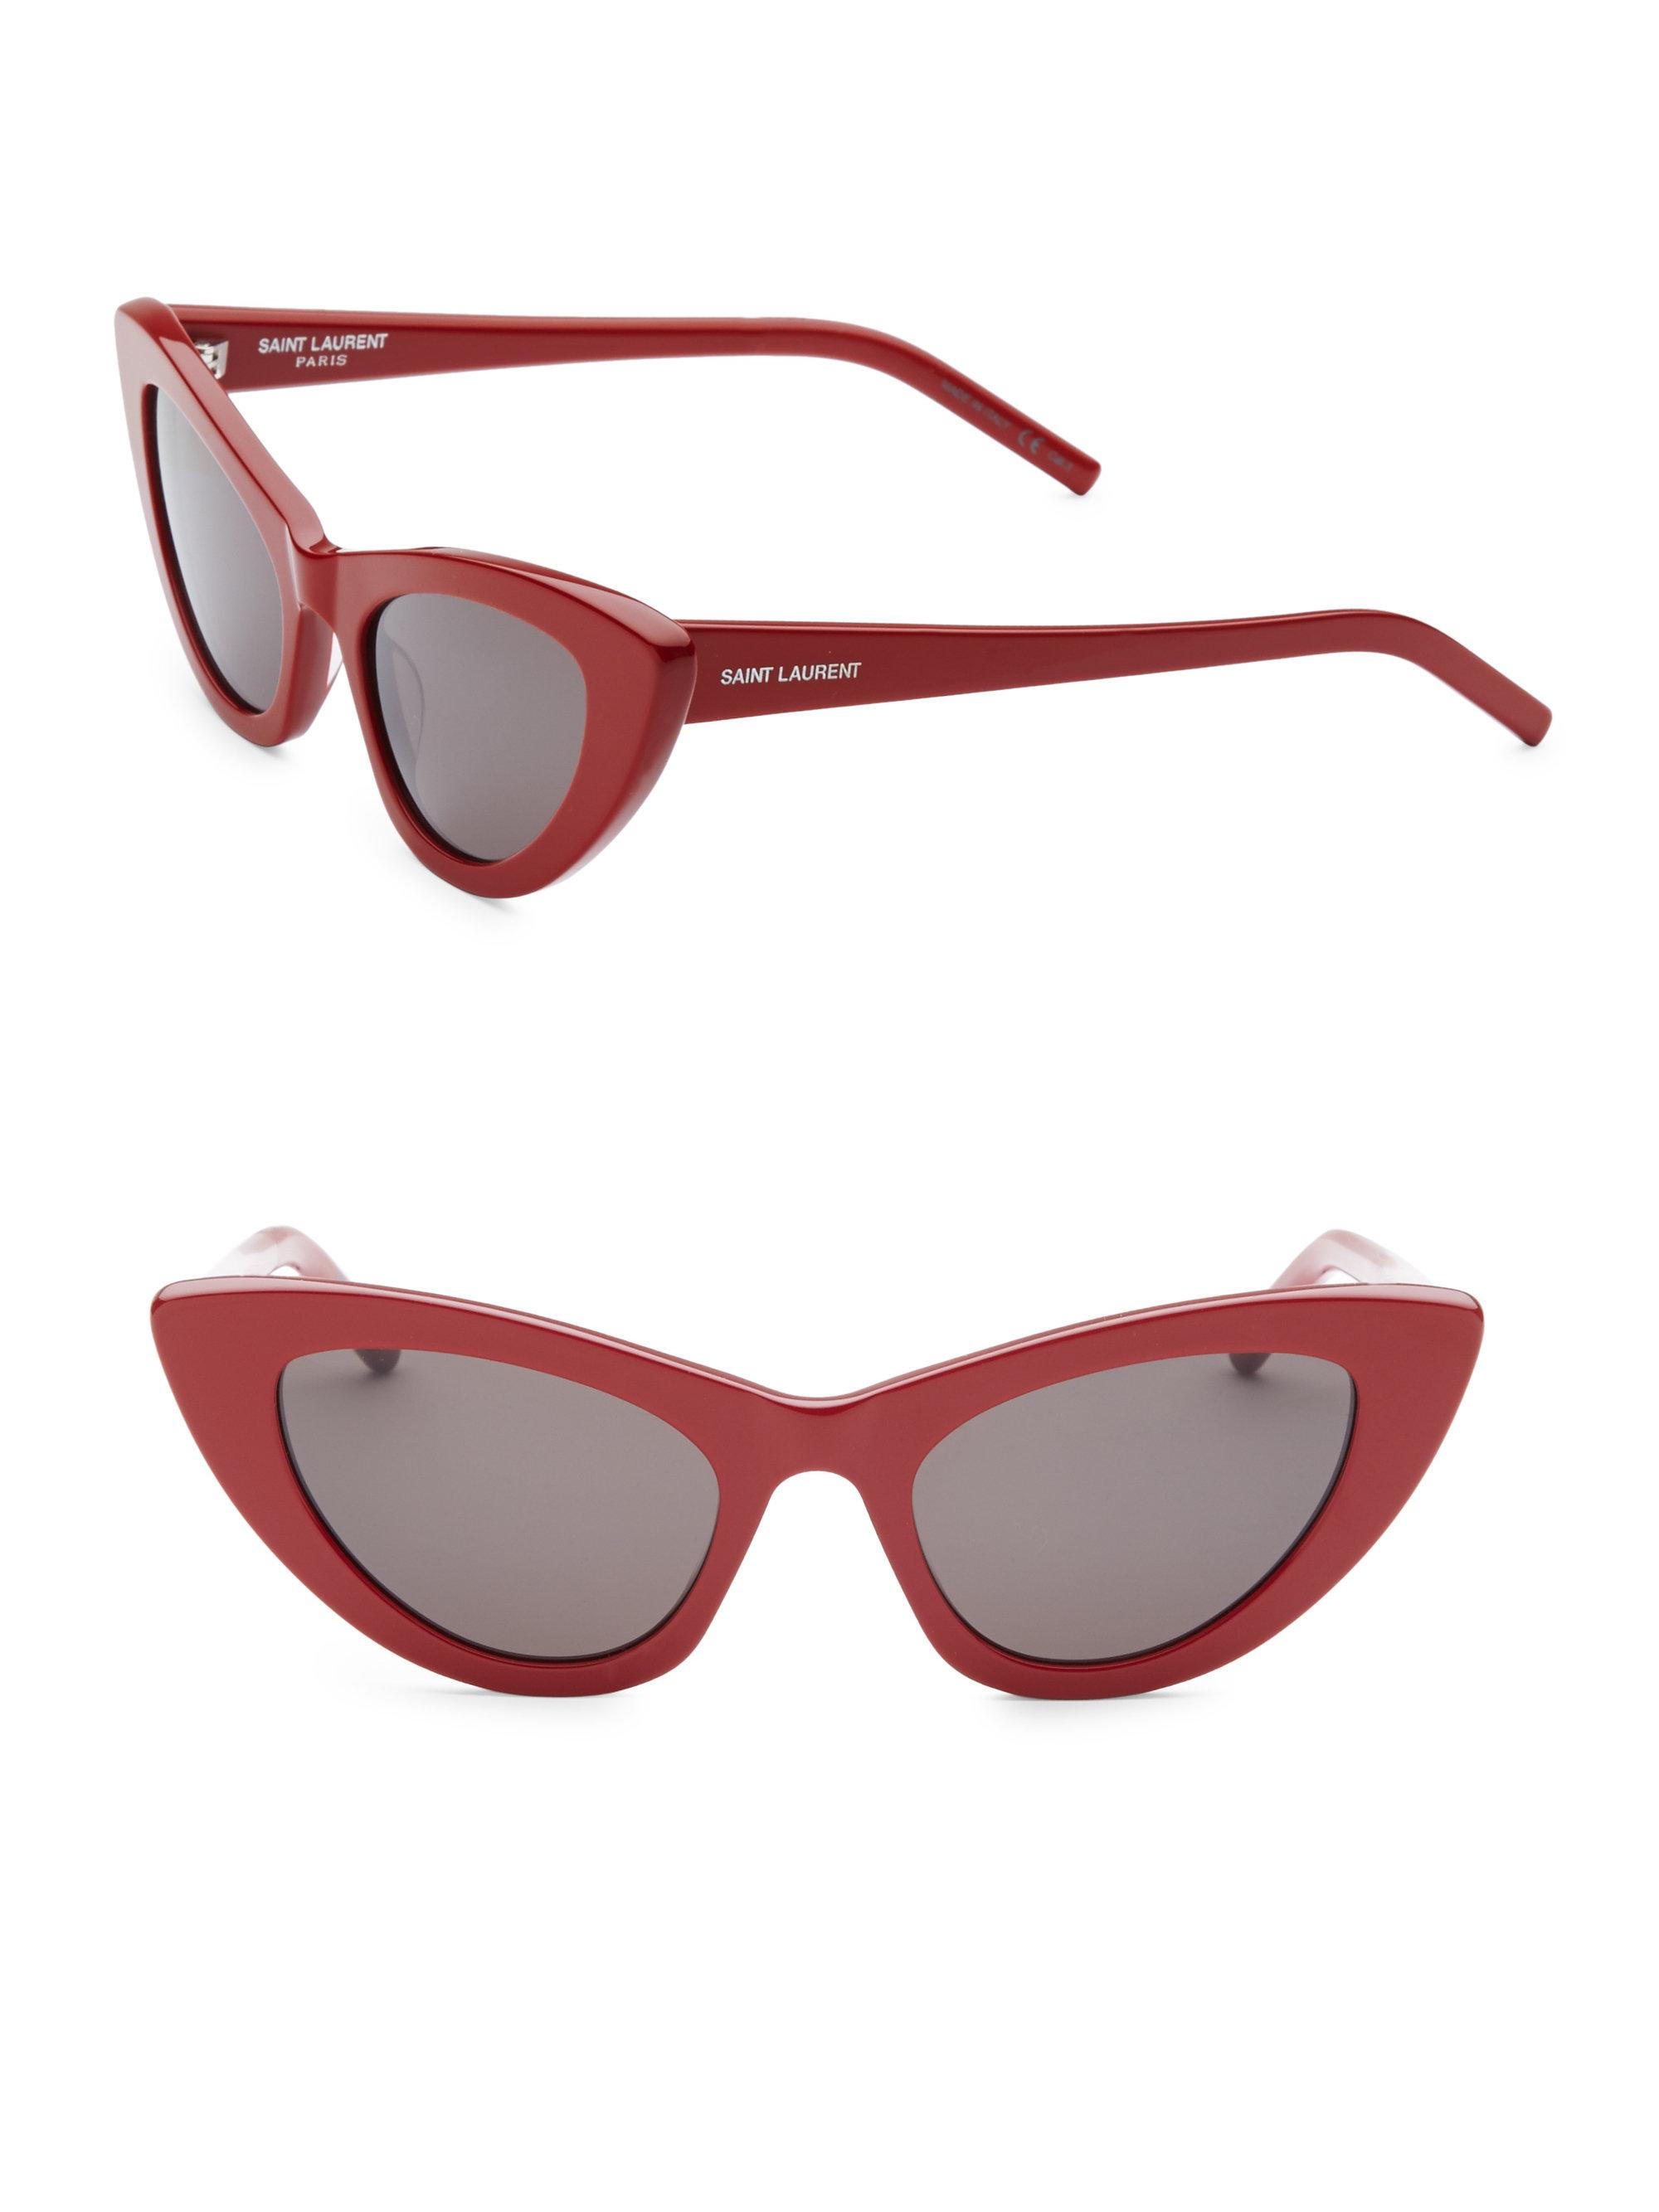 808fbdab34 Saint Laurent - 52mm Red New Wave 213 Lily Sunglasses - Lyst. View  fullscreen